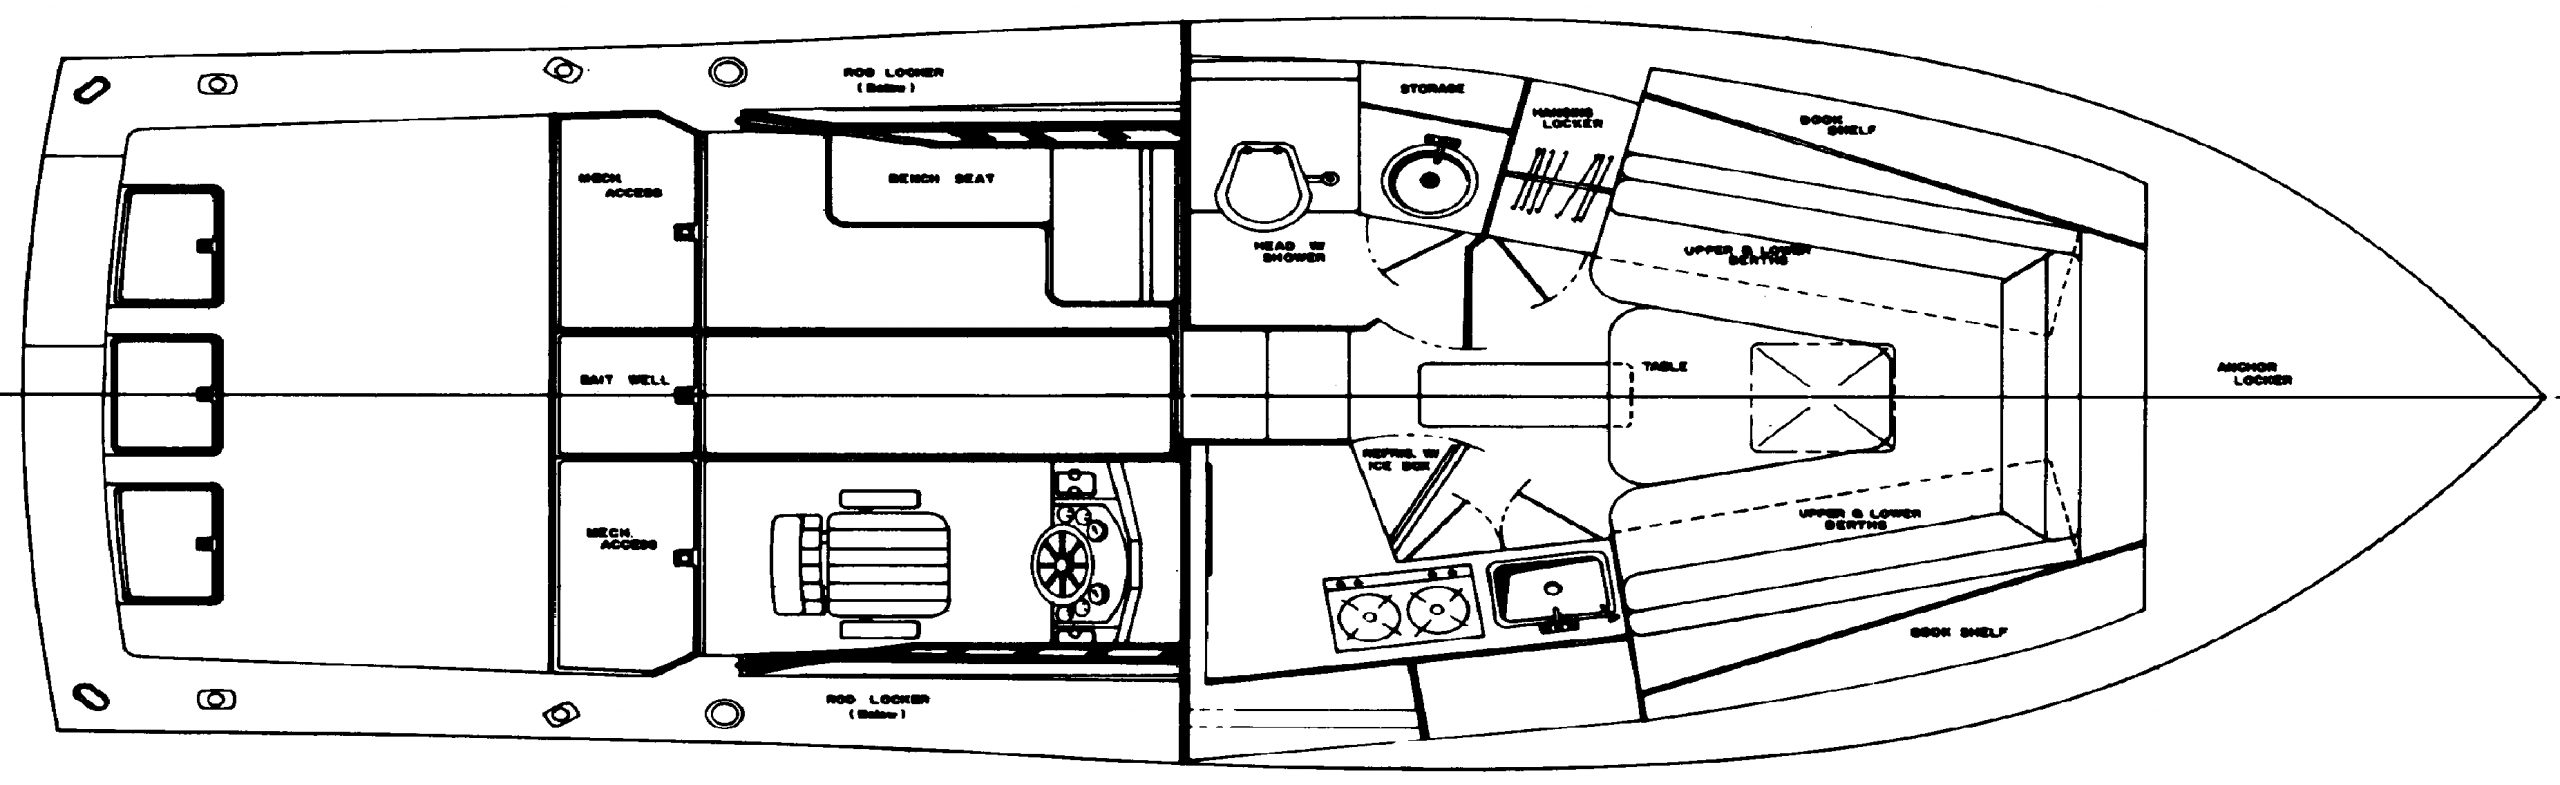 31 Sportfisherman Floor Plan 1